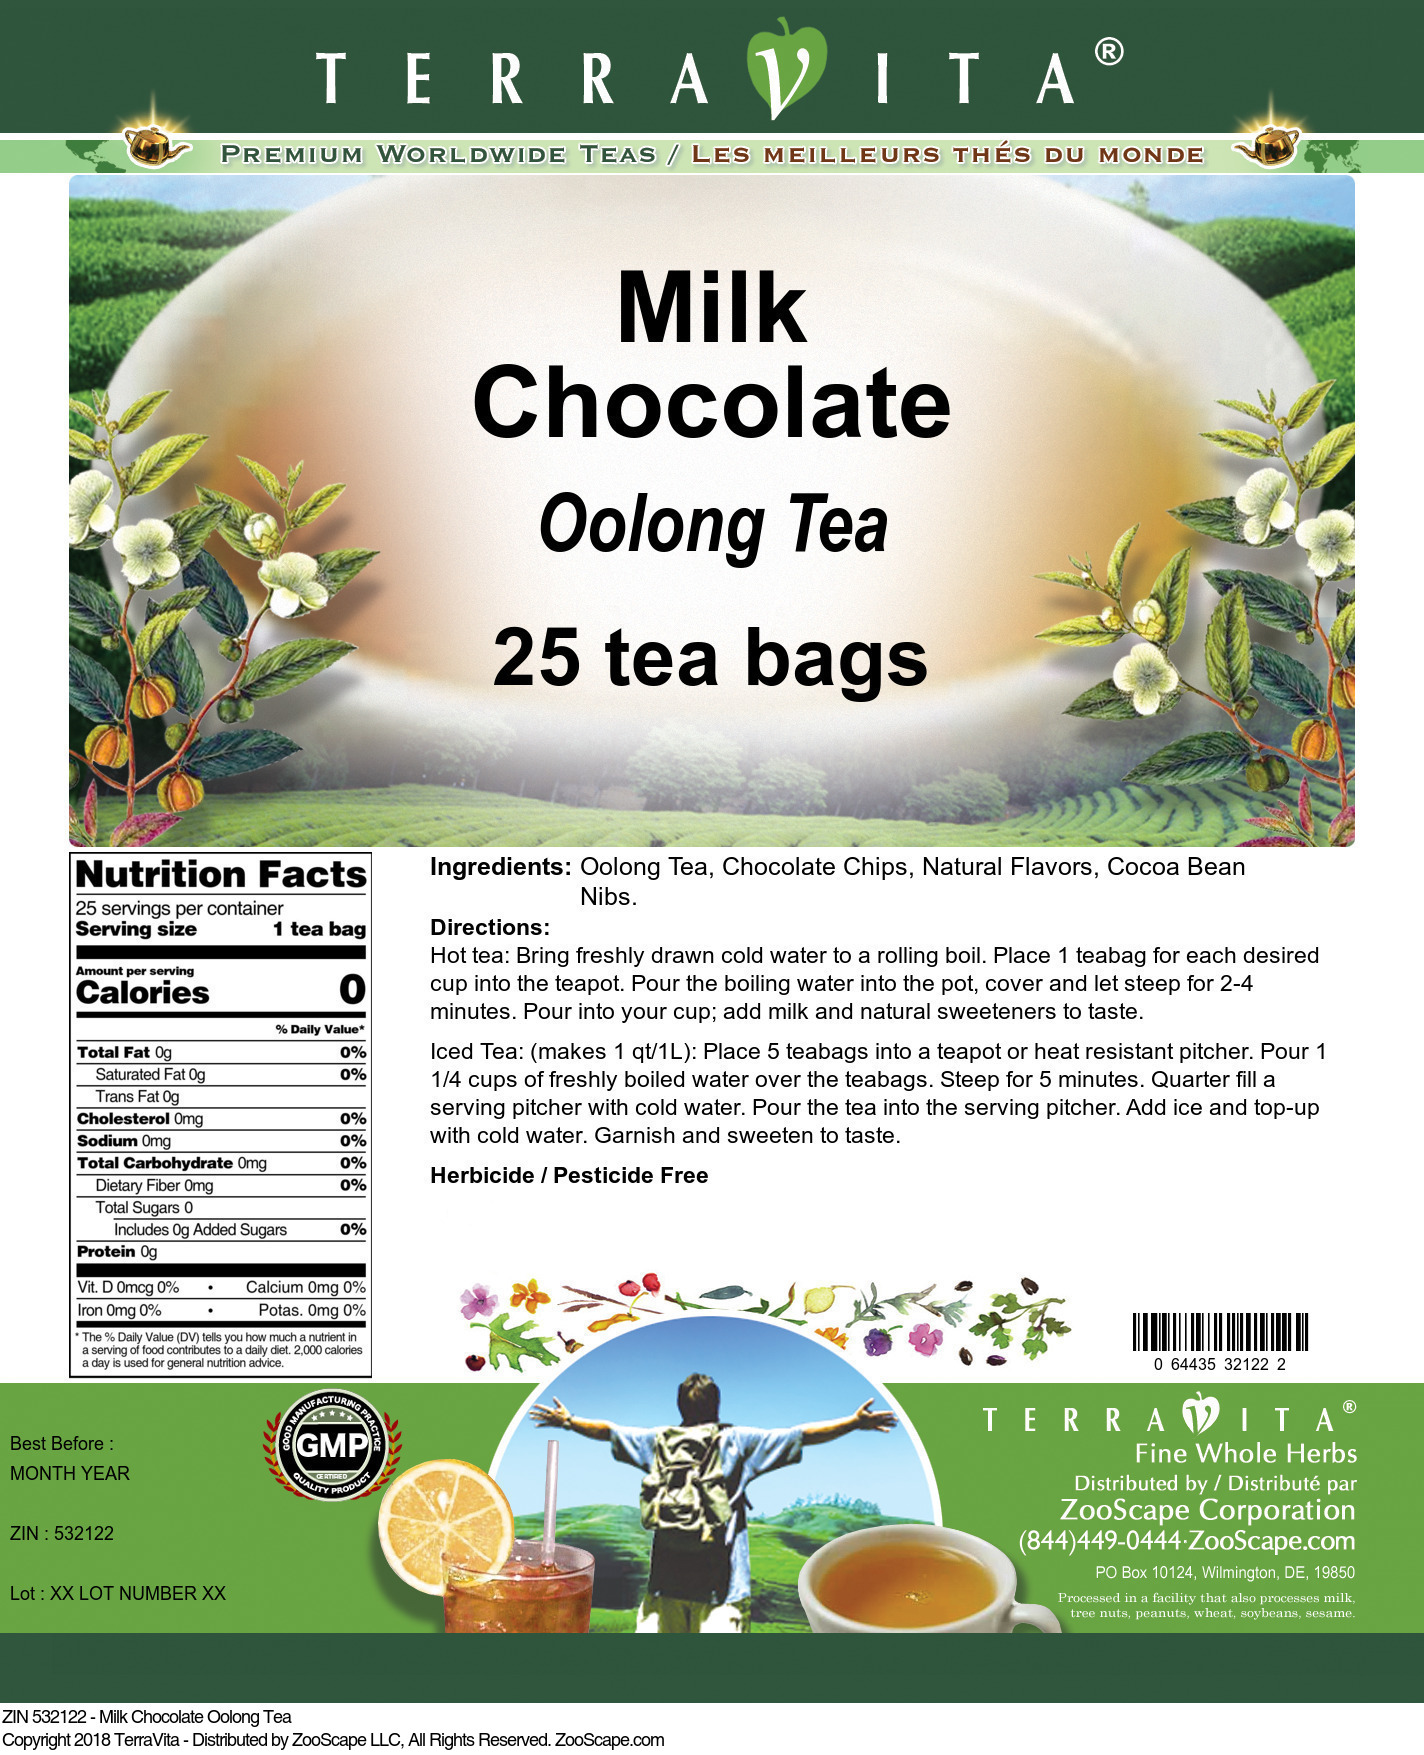 Milk Chocolate Oolong Tea